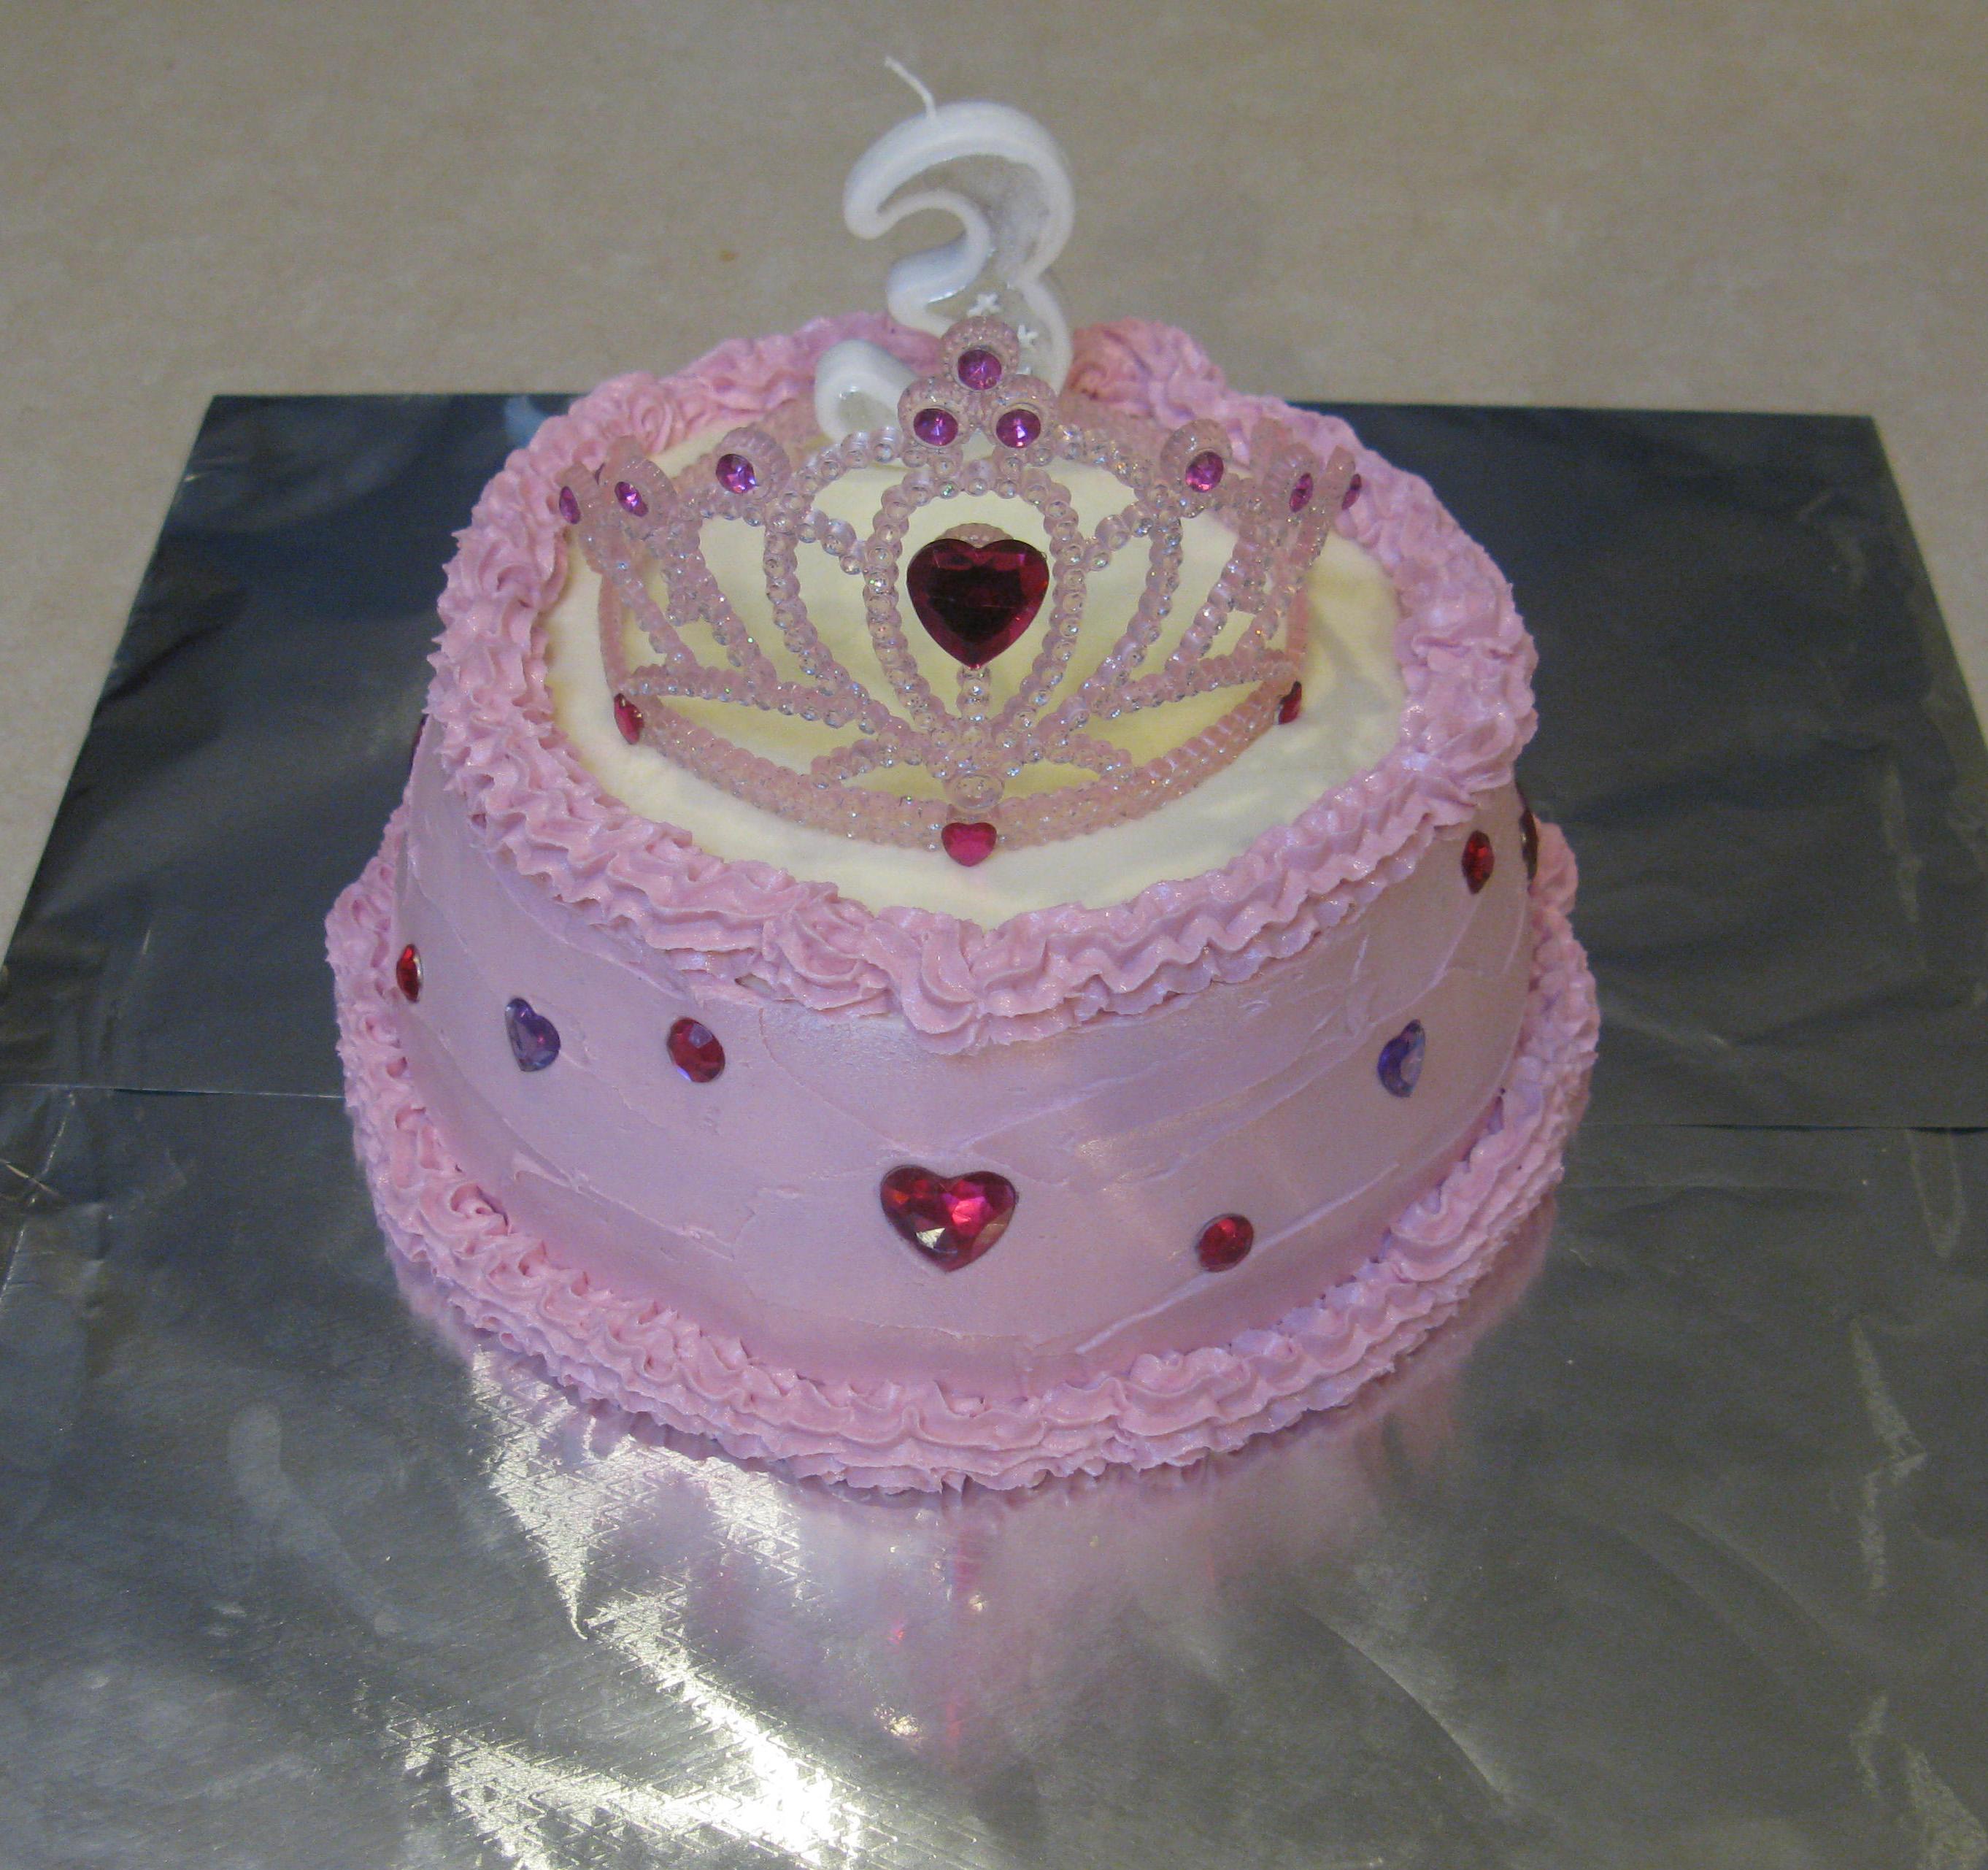 Princess Cake Decorating Ideas On A 9x13 Cake